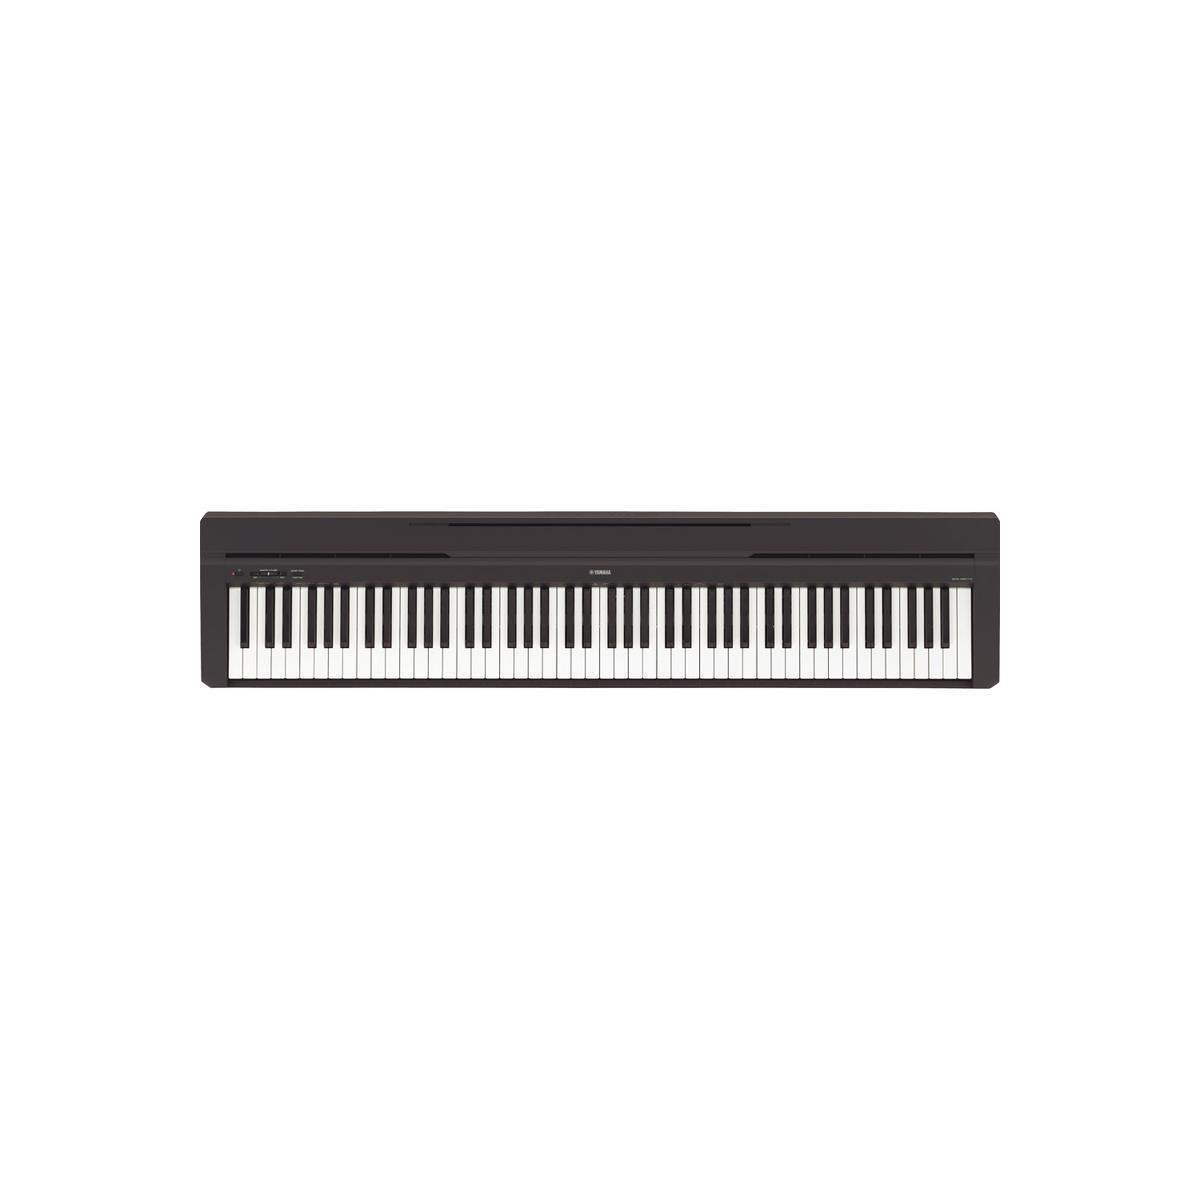 Yamaha P-45 88-Key Digital Piano $330 + free shipping